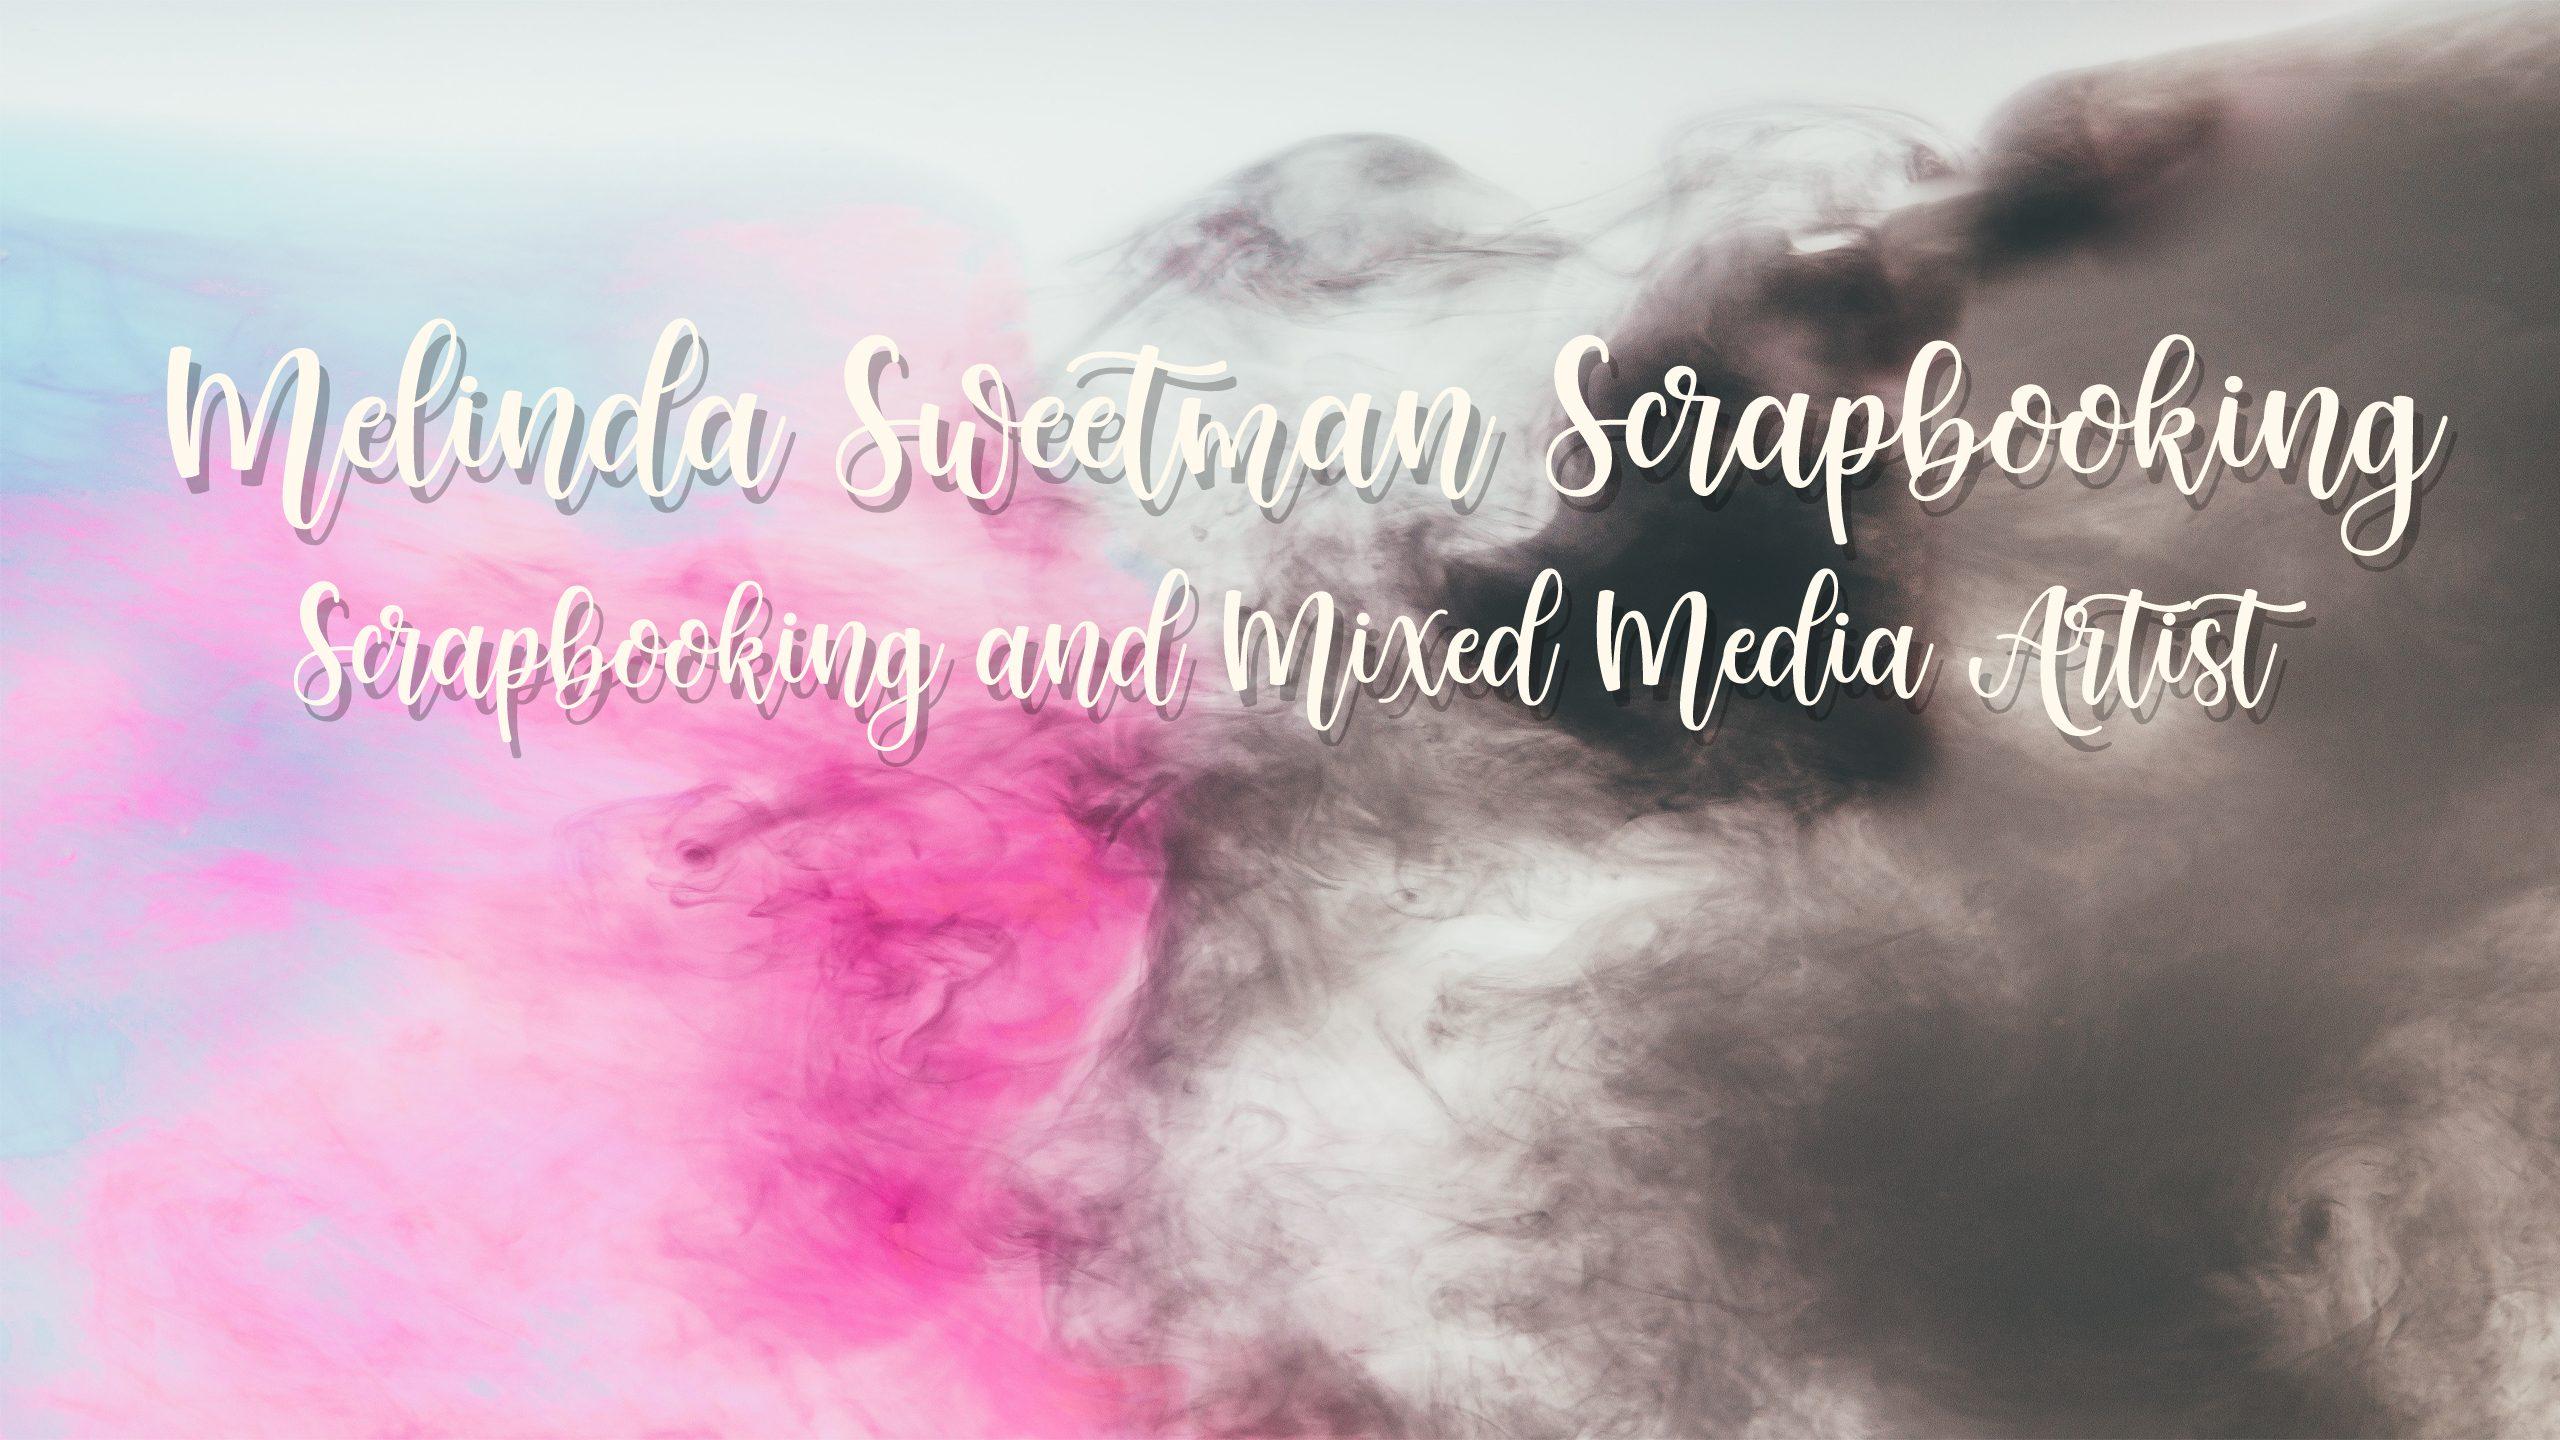 Melinda Sweetman Scrapbooking